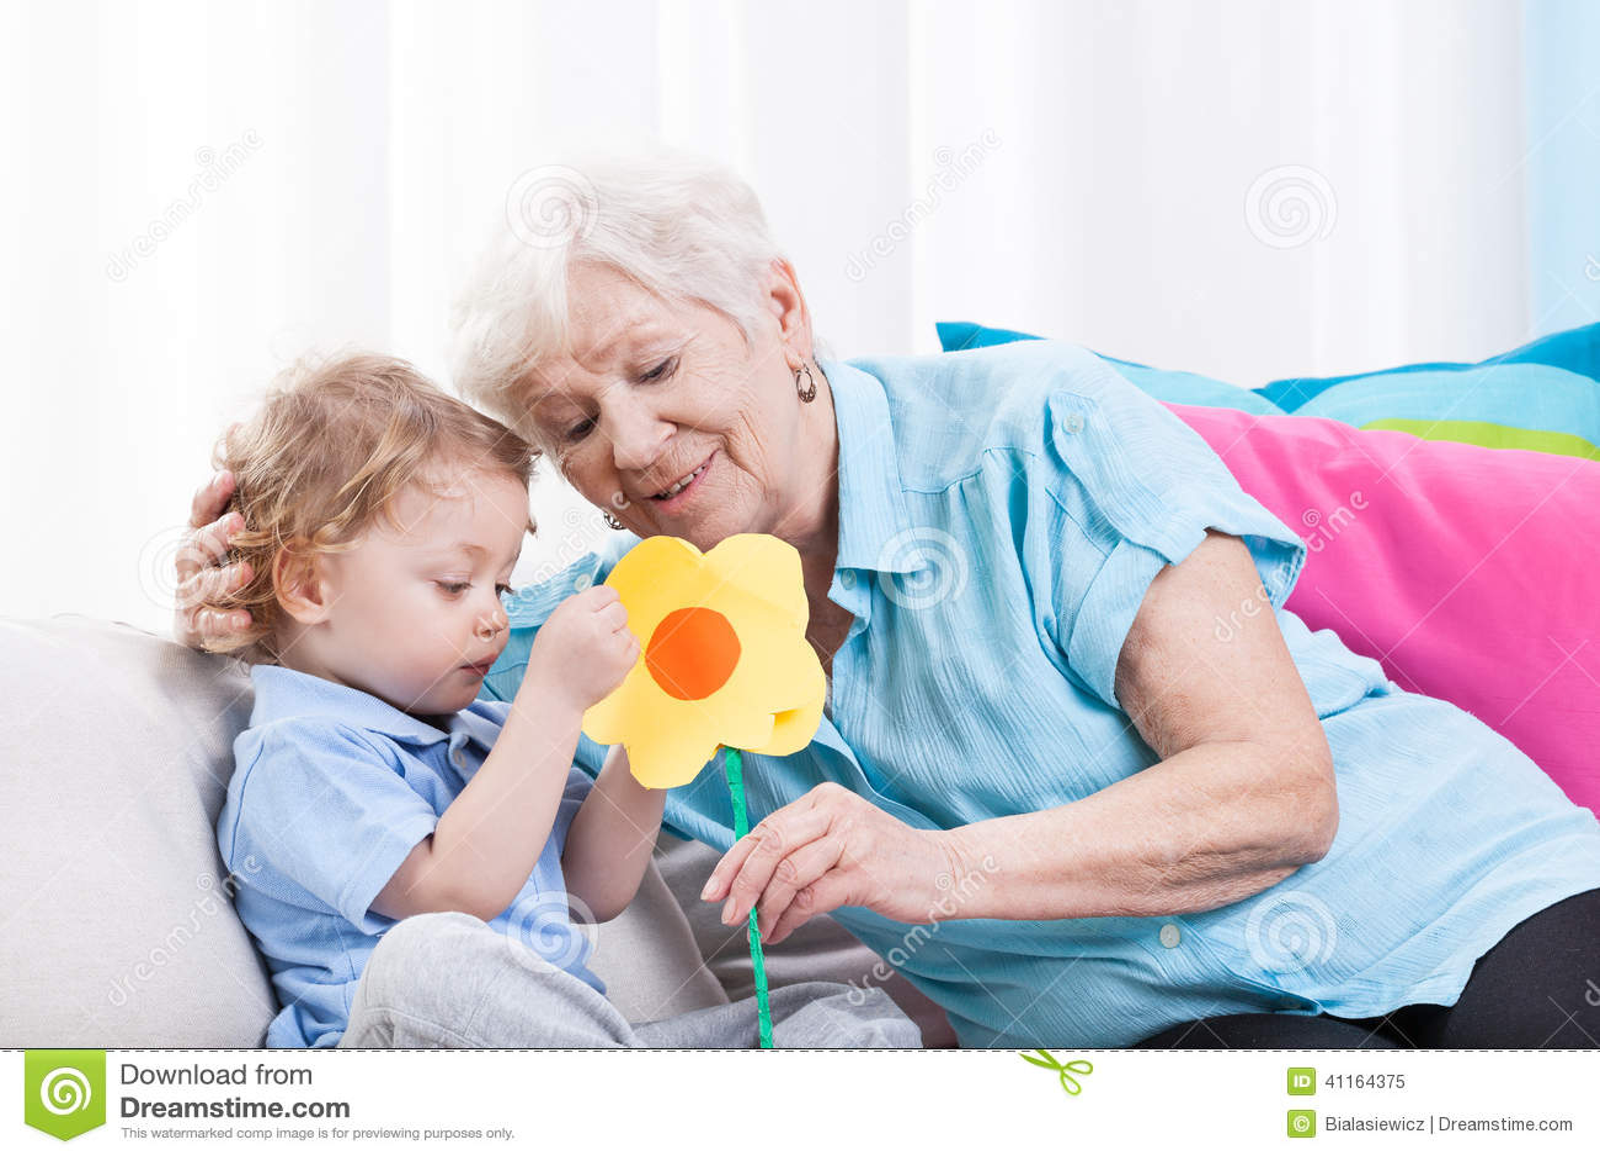 Як внук трахає бабушку 3 фотография